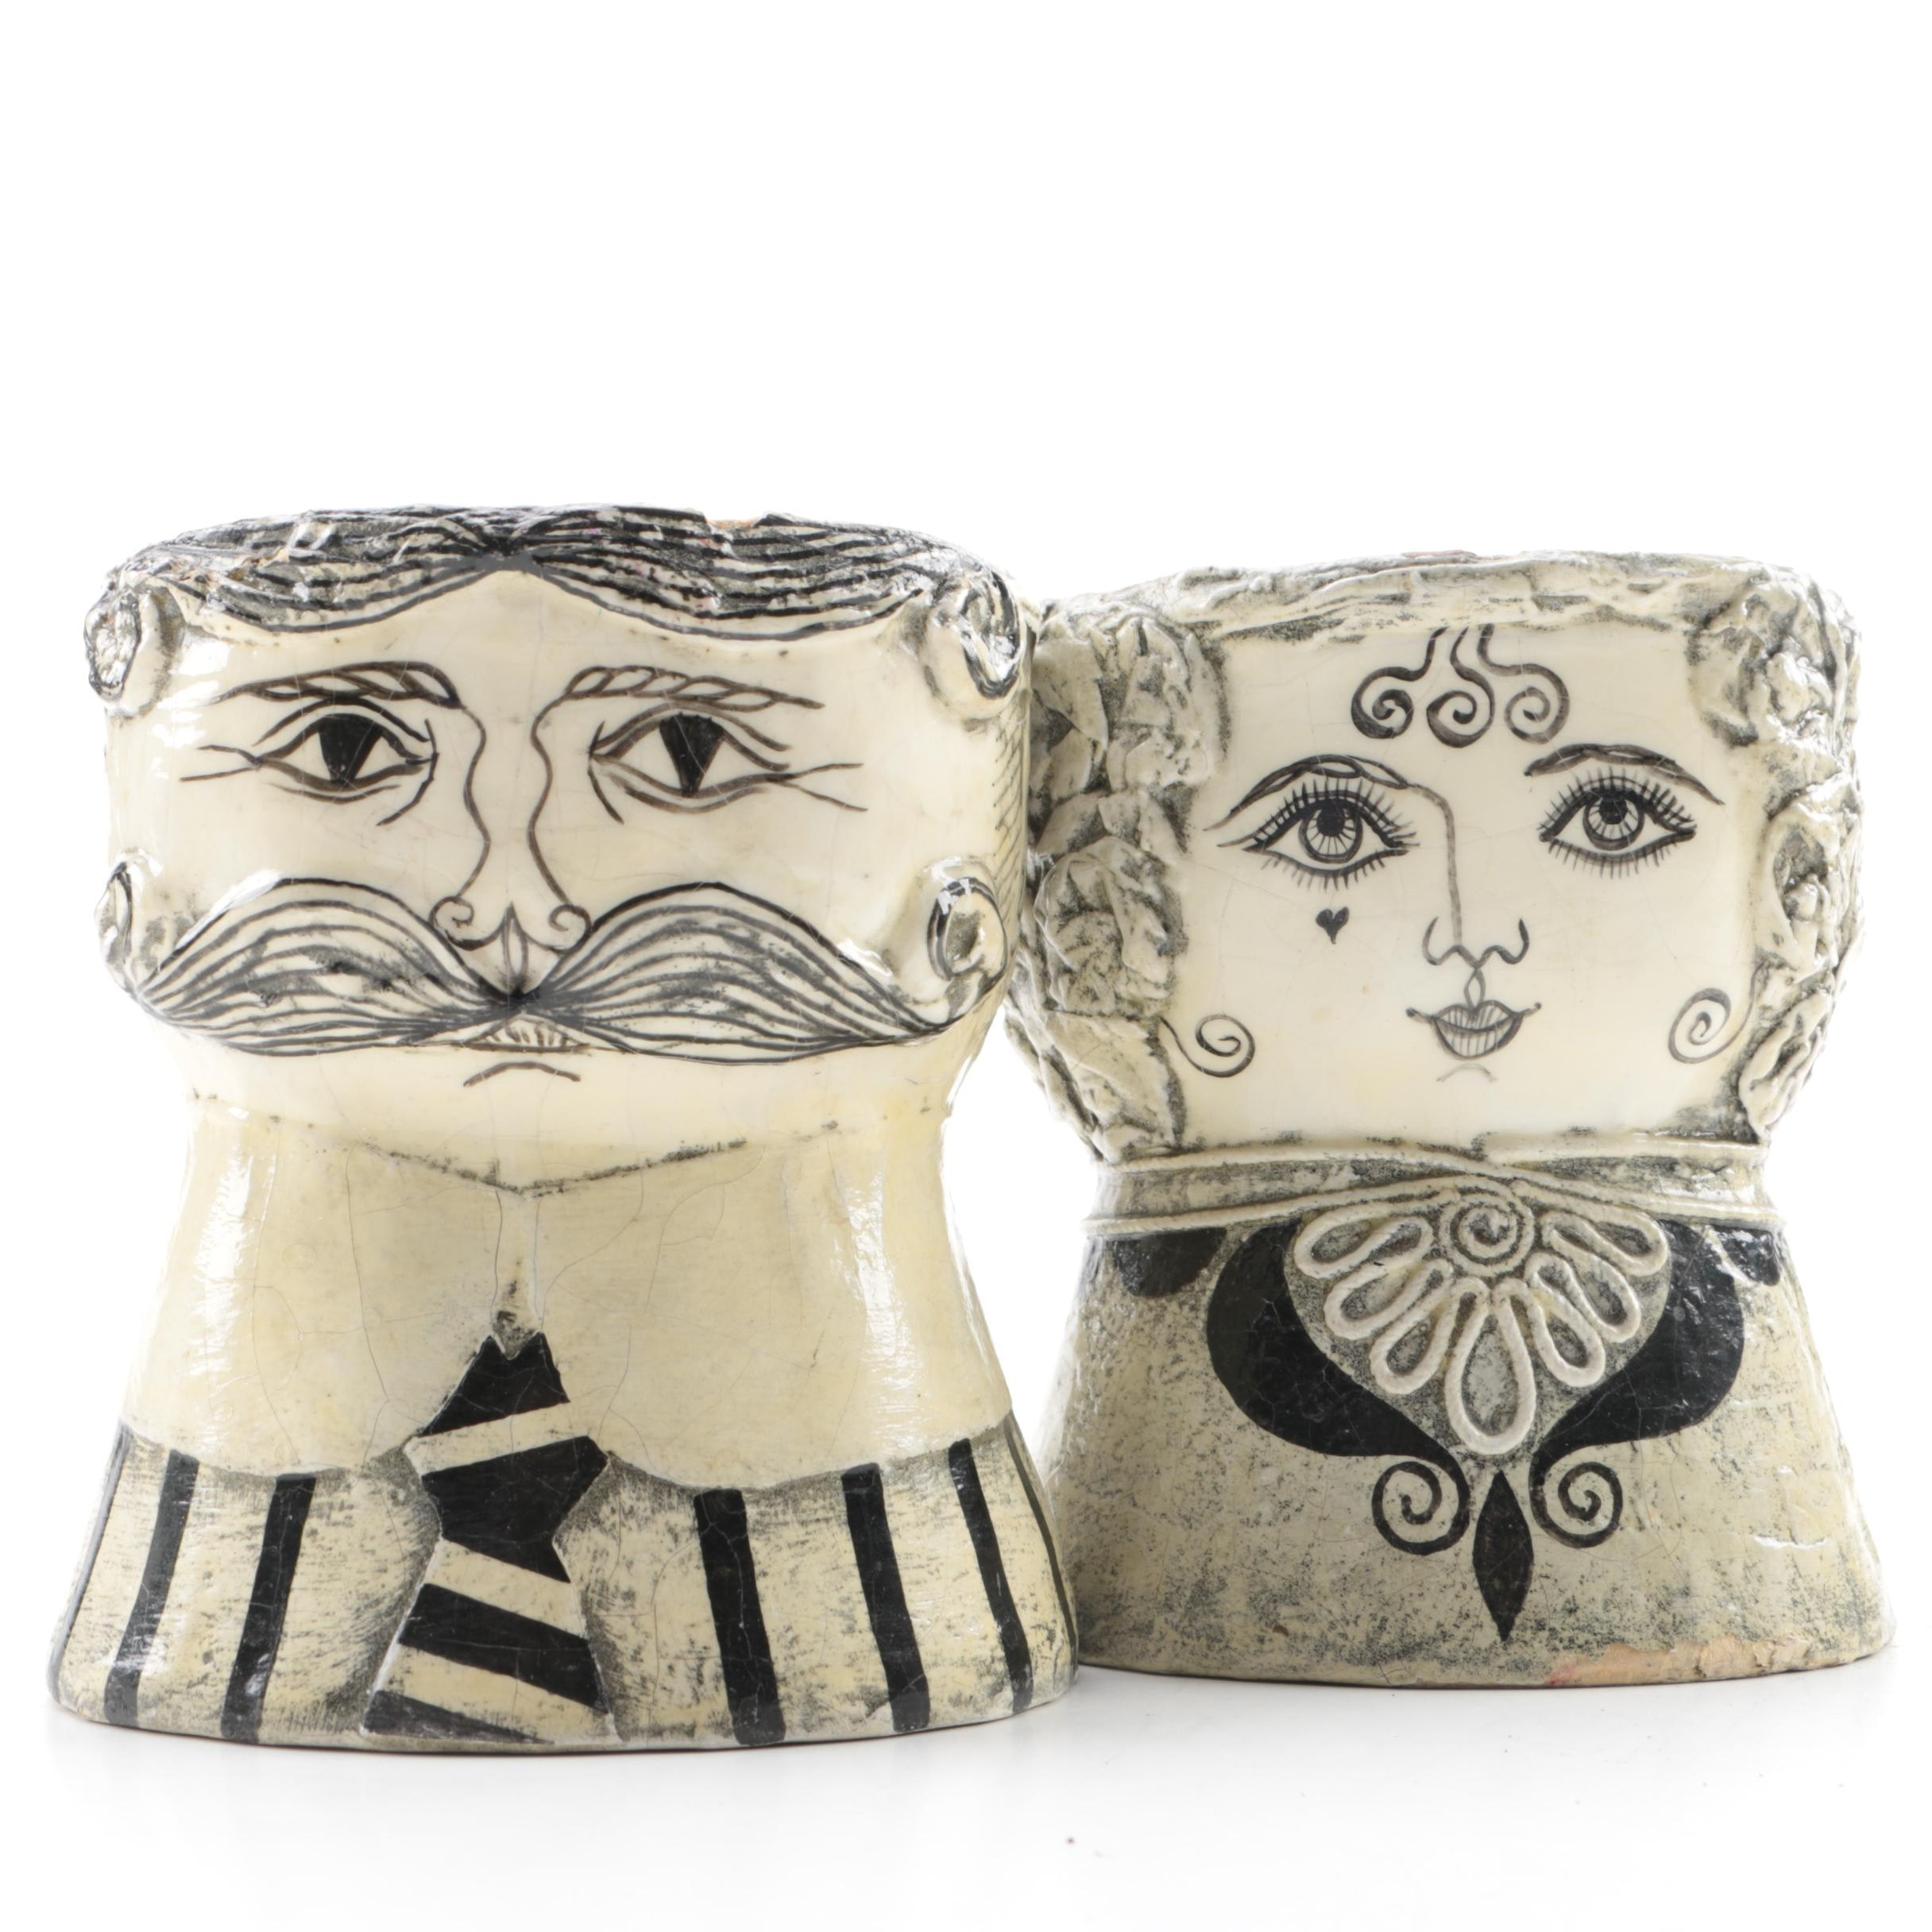 Folk Art Man and Woman Papier Mache Vases by Gemma Taccogna